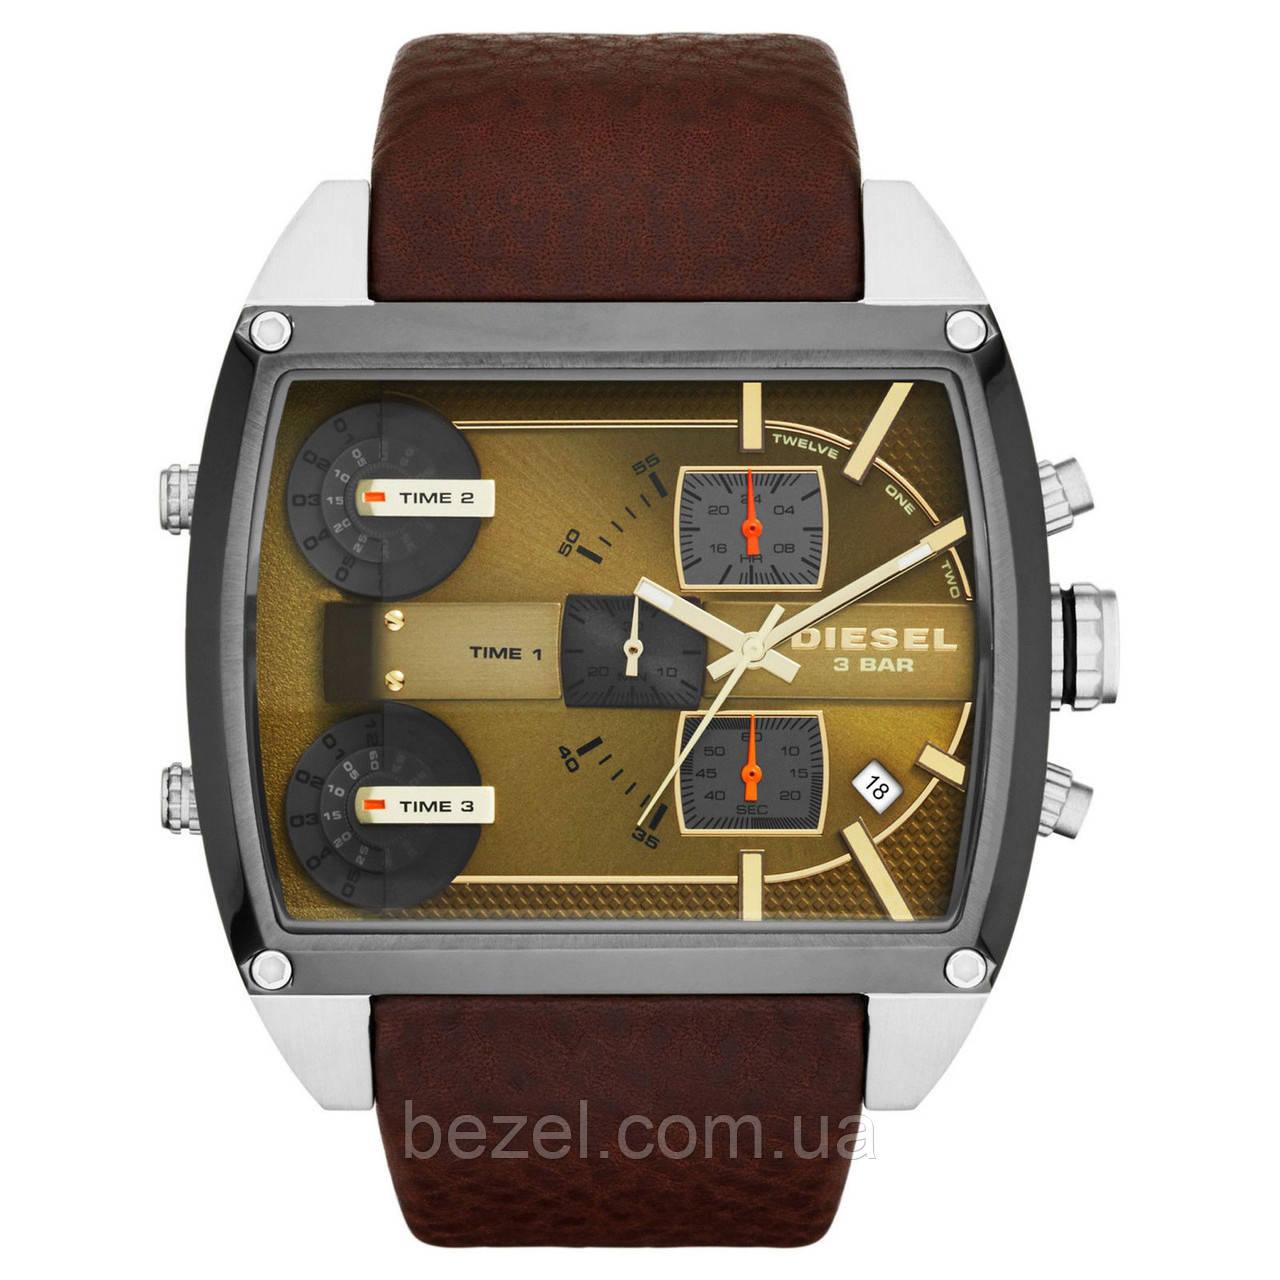 Мужские часы Diesel DZ7327